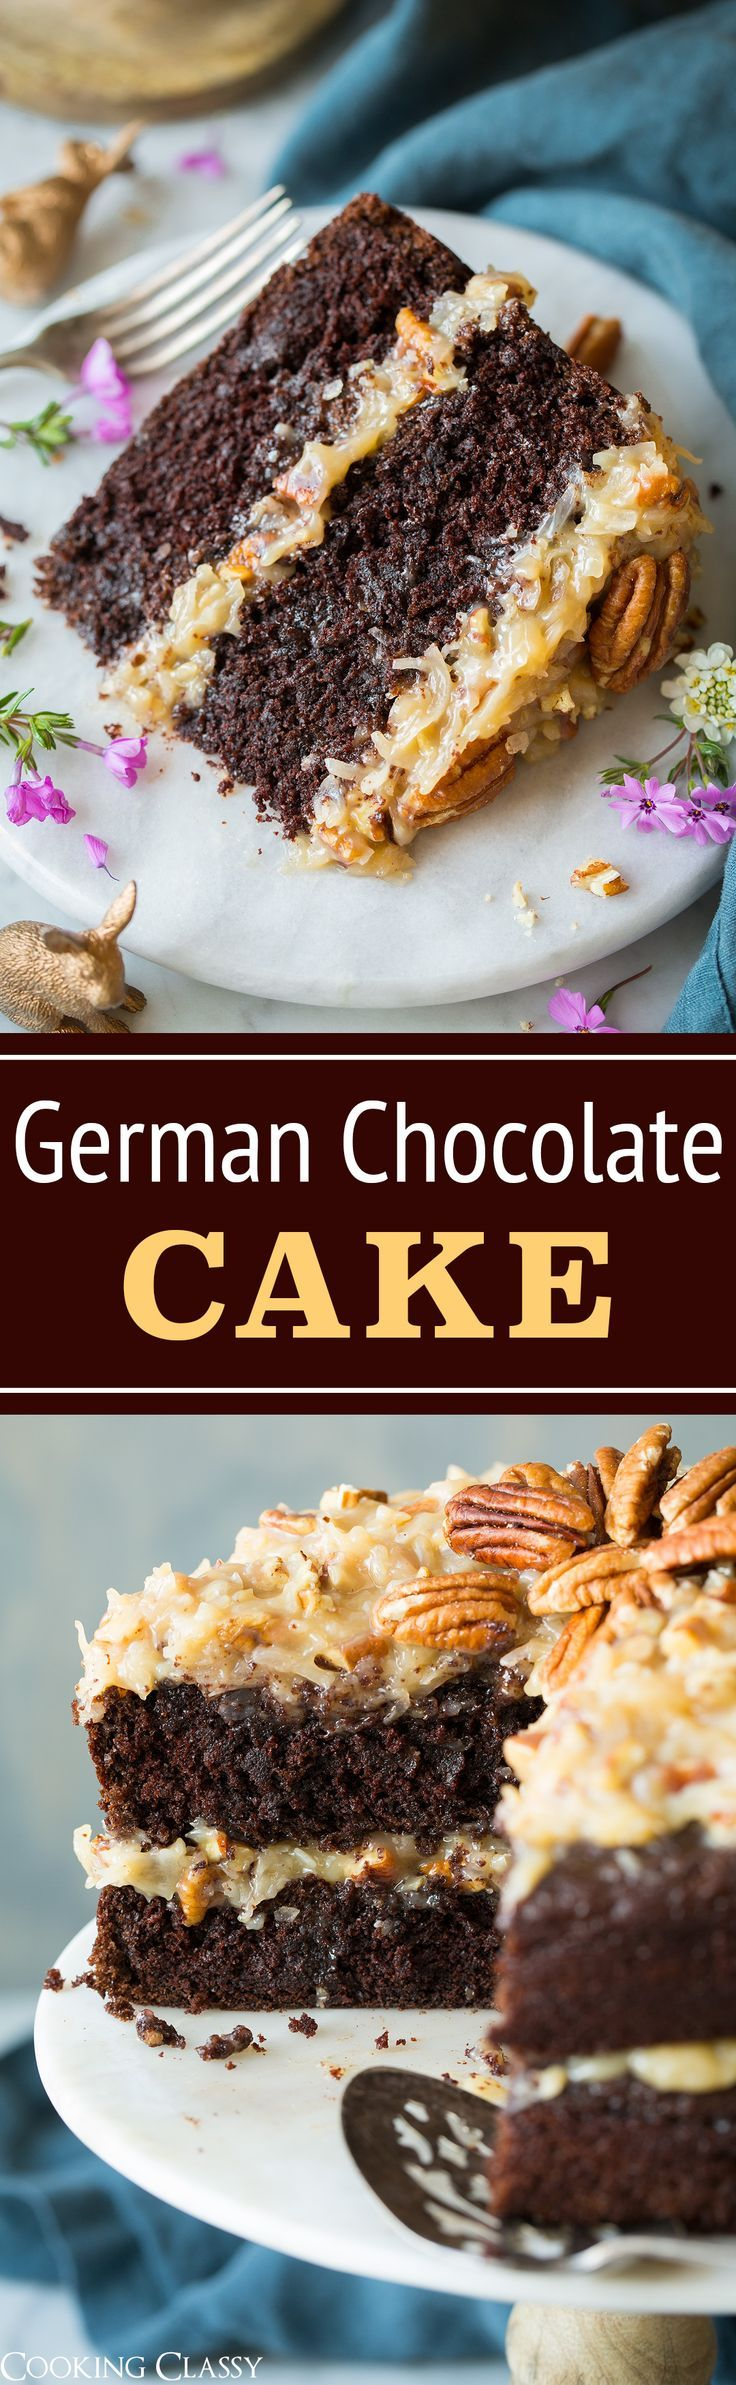 German Chocolate Cake - Cooking Classy